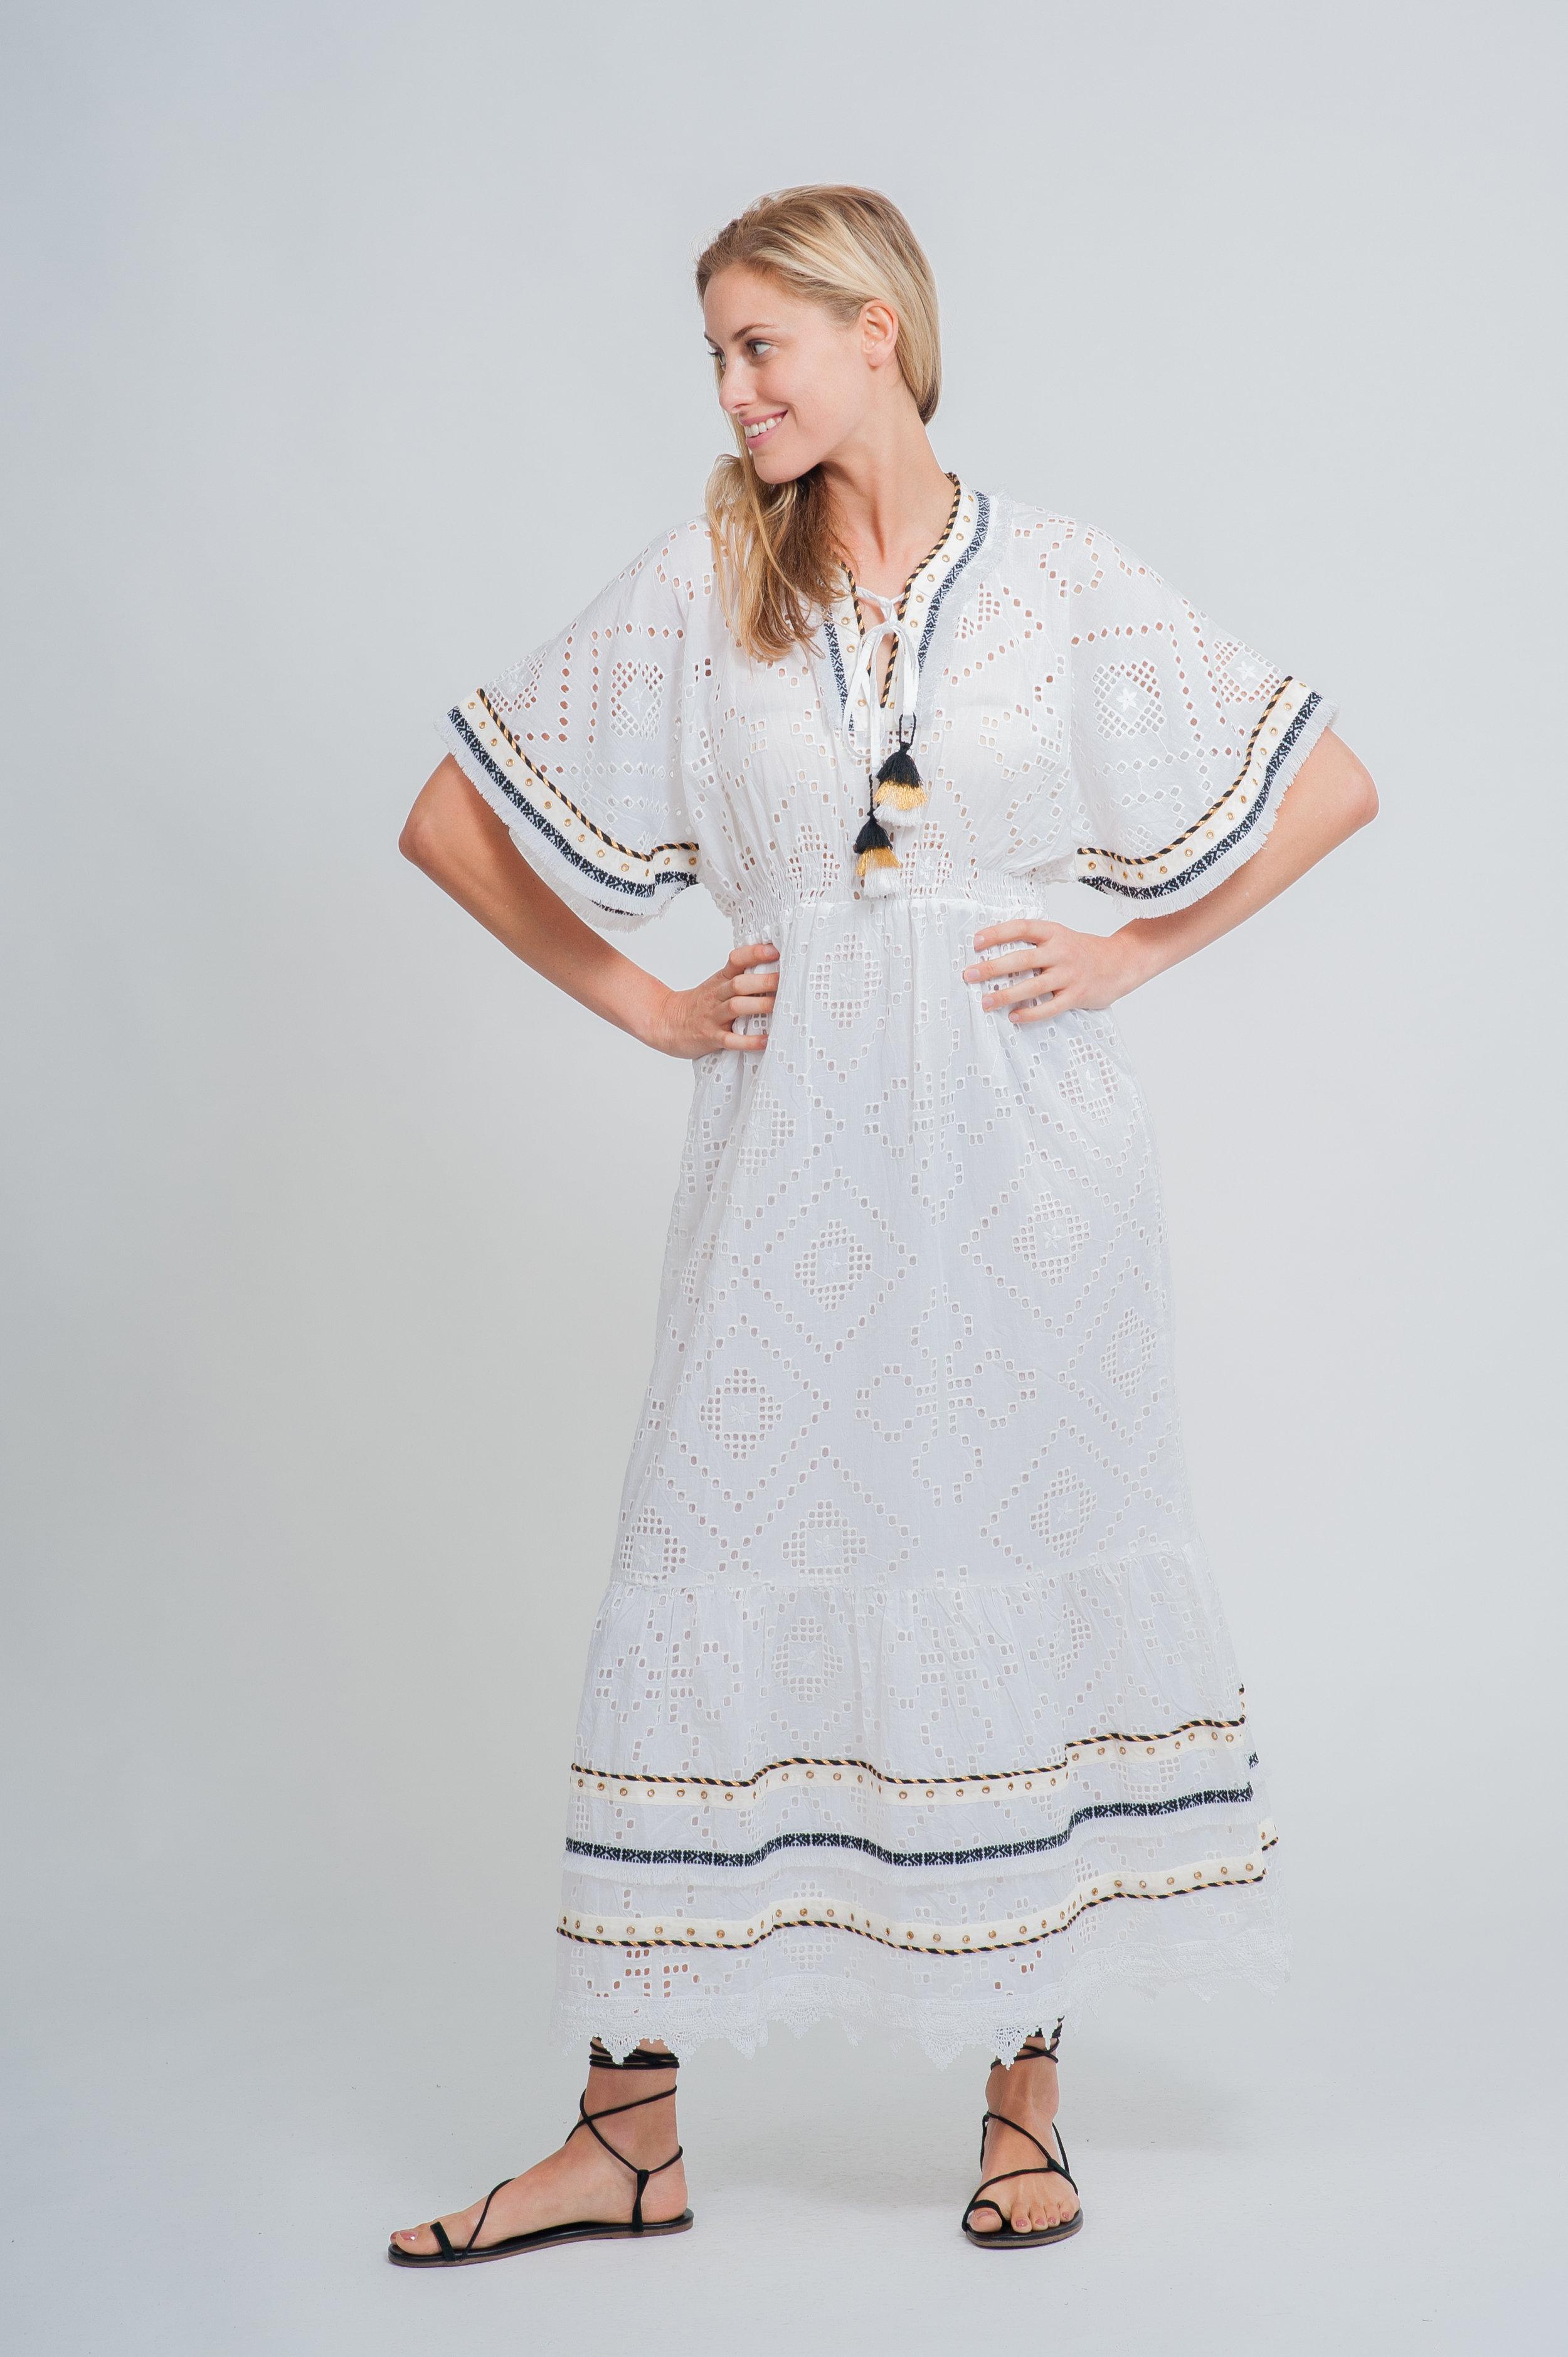 SS19-31 LA MANDALA CUTWORK LACE MAXI KAFTAN DRESS